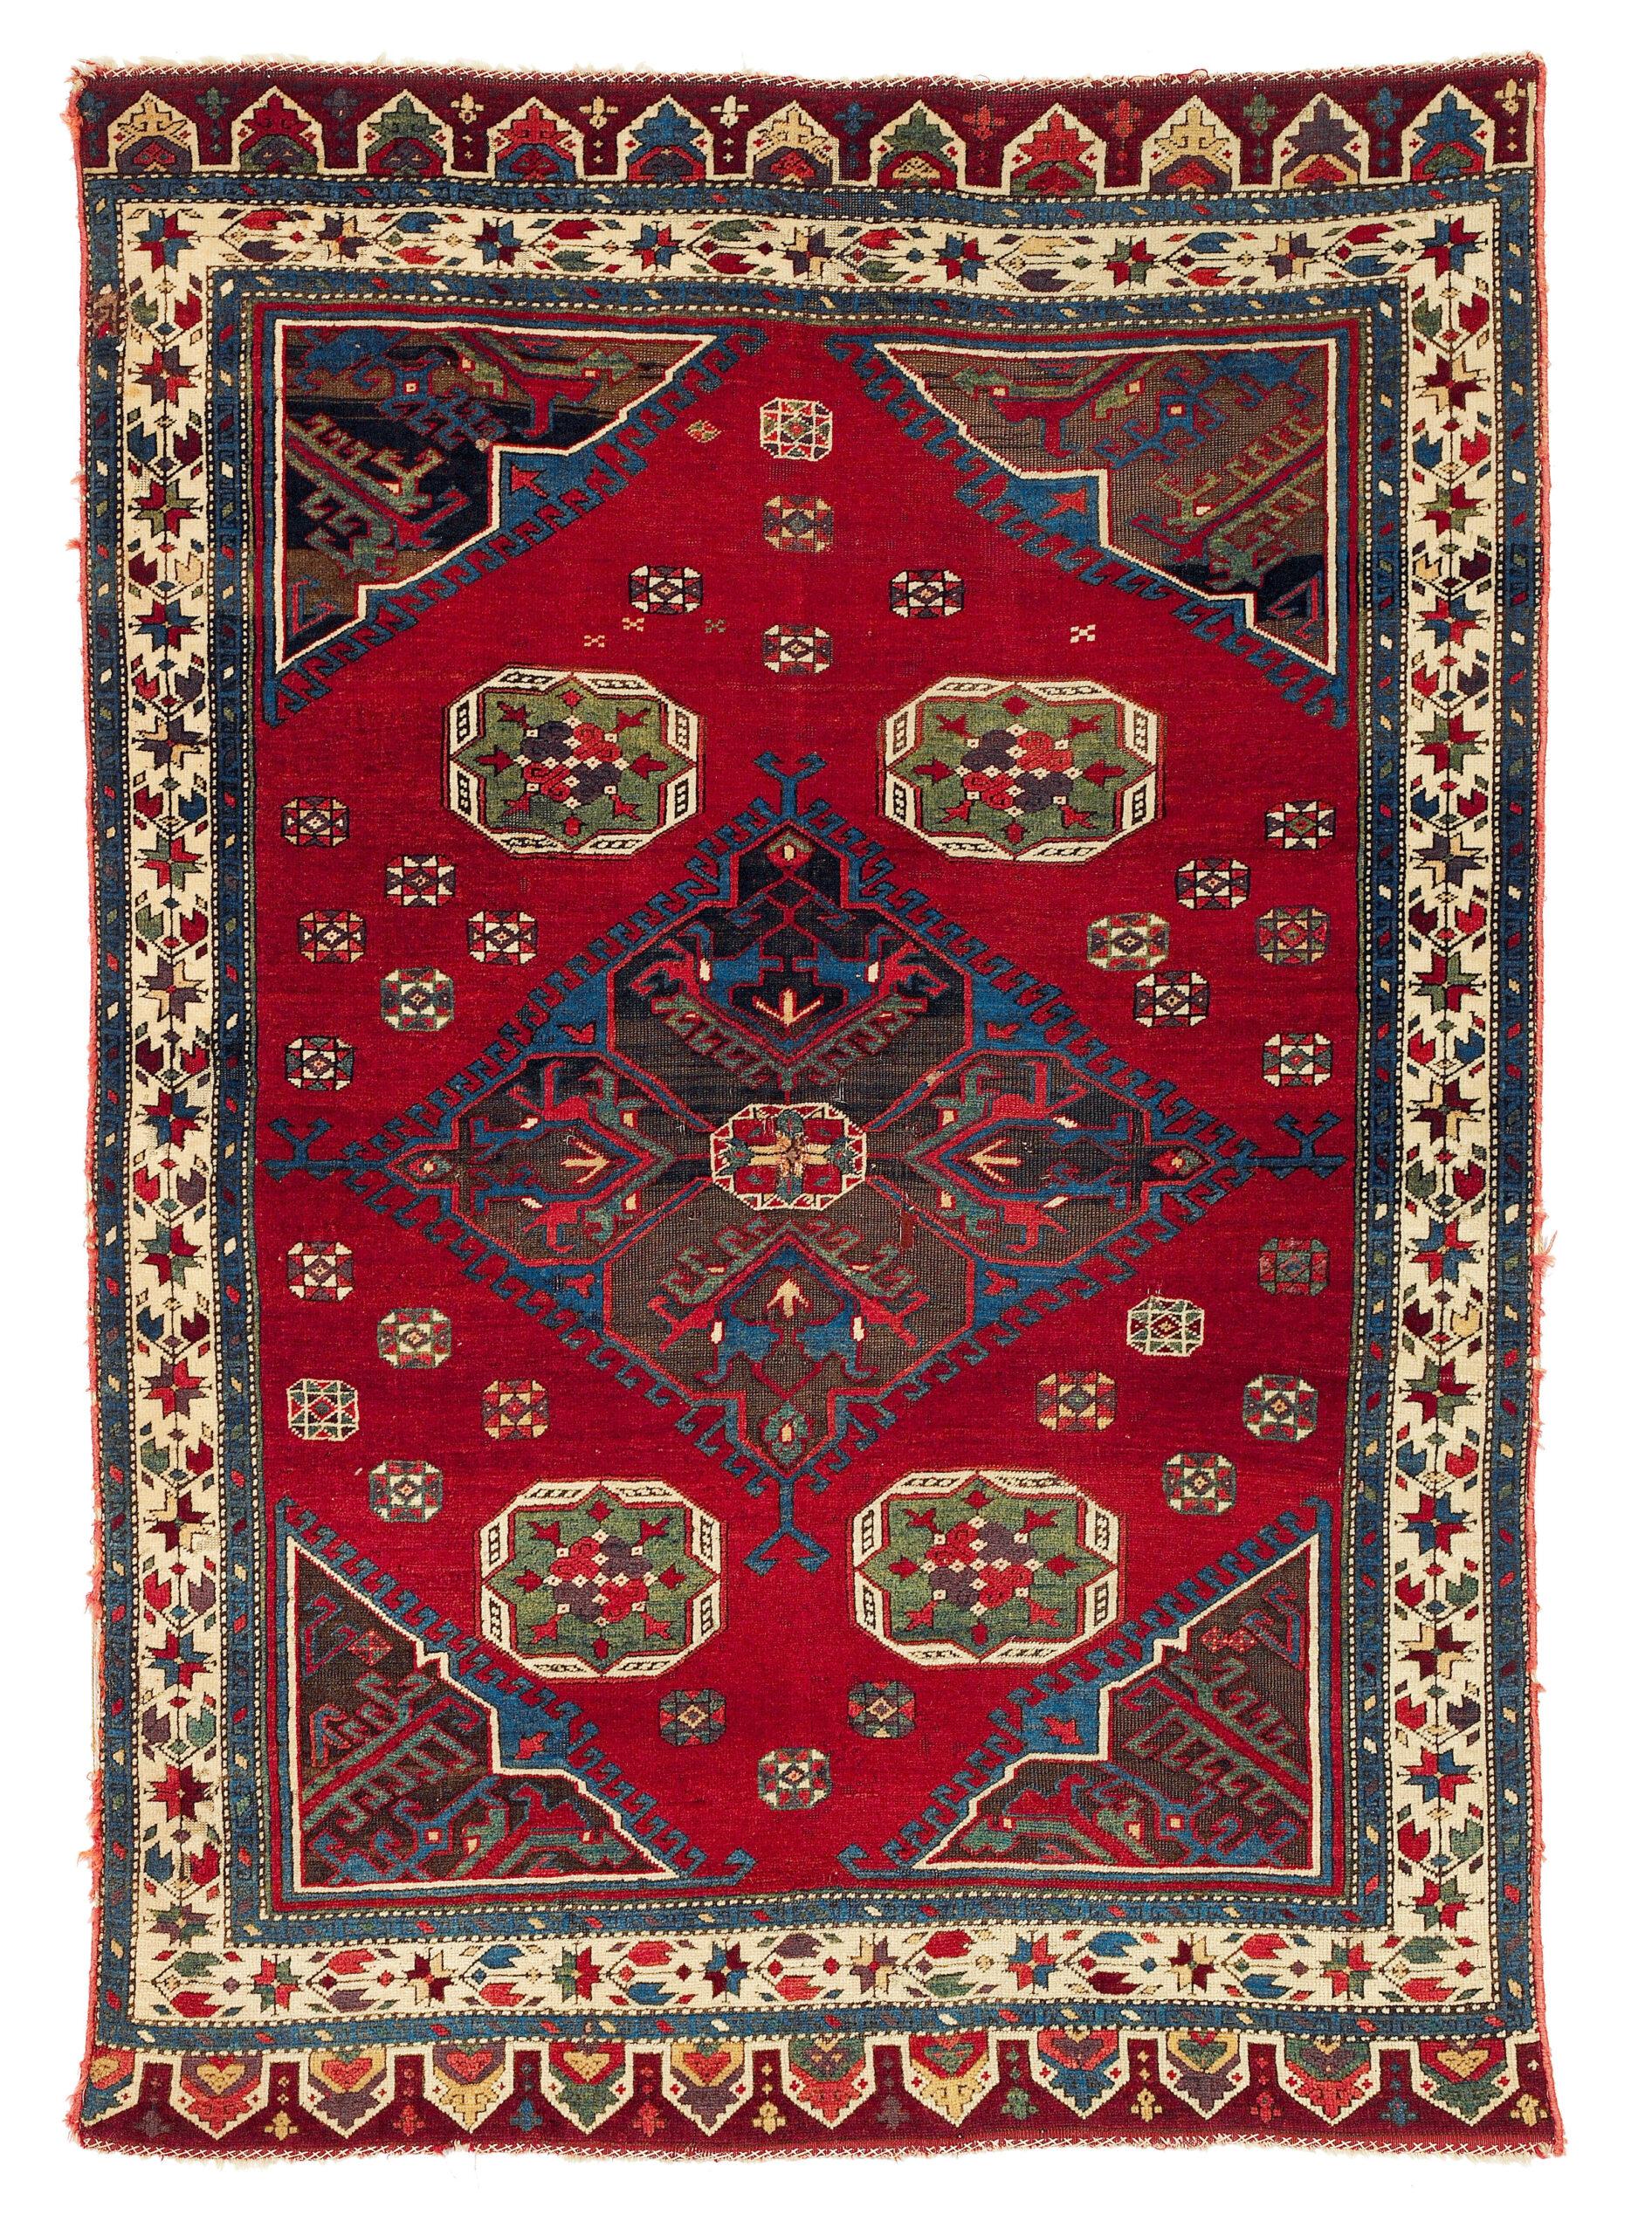 17-18th Century Konya workshop carpet, Central Anatolia